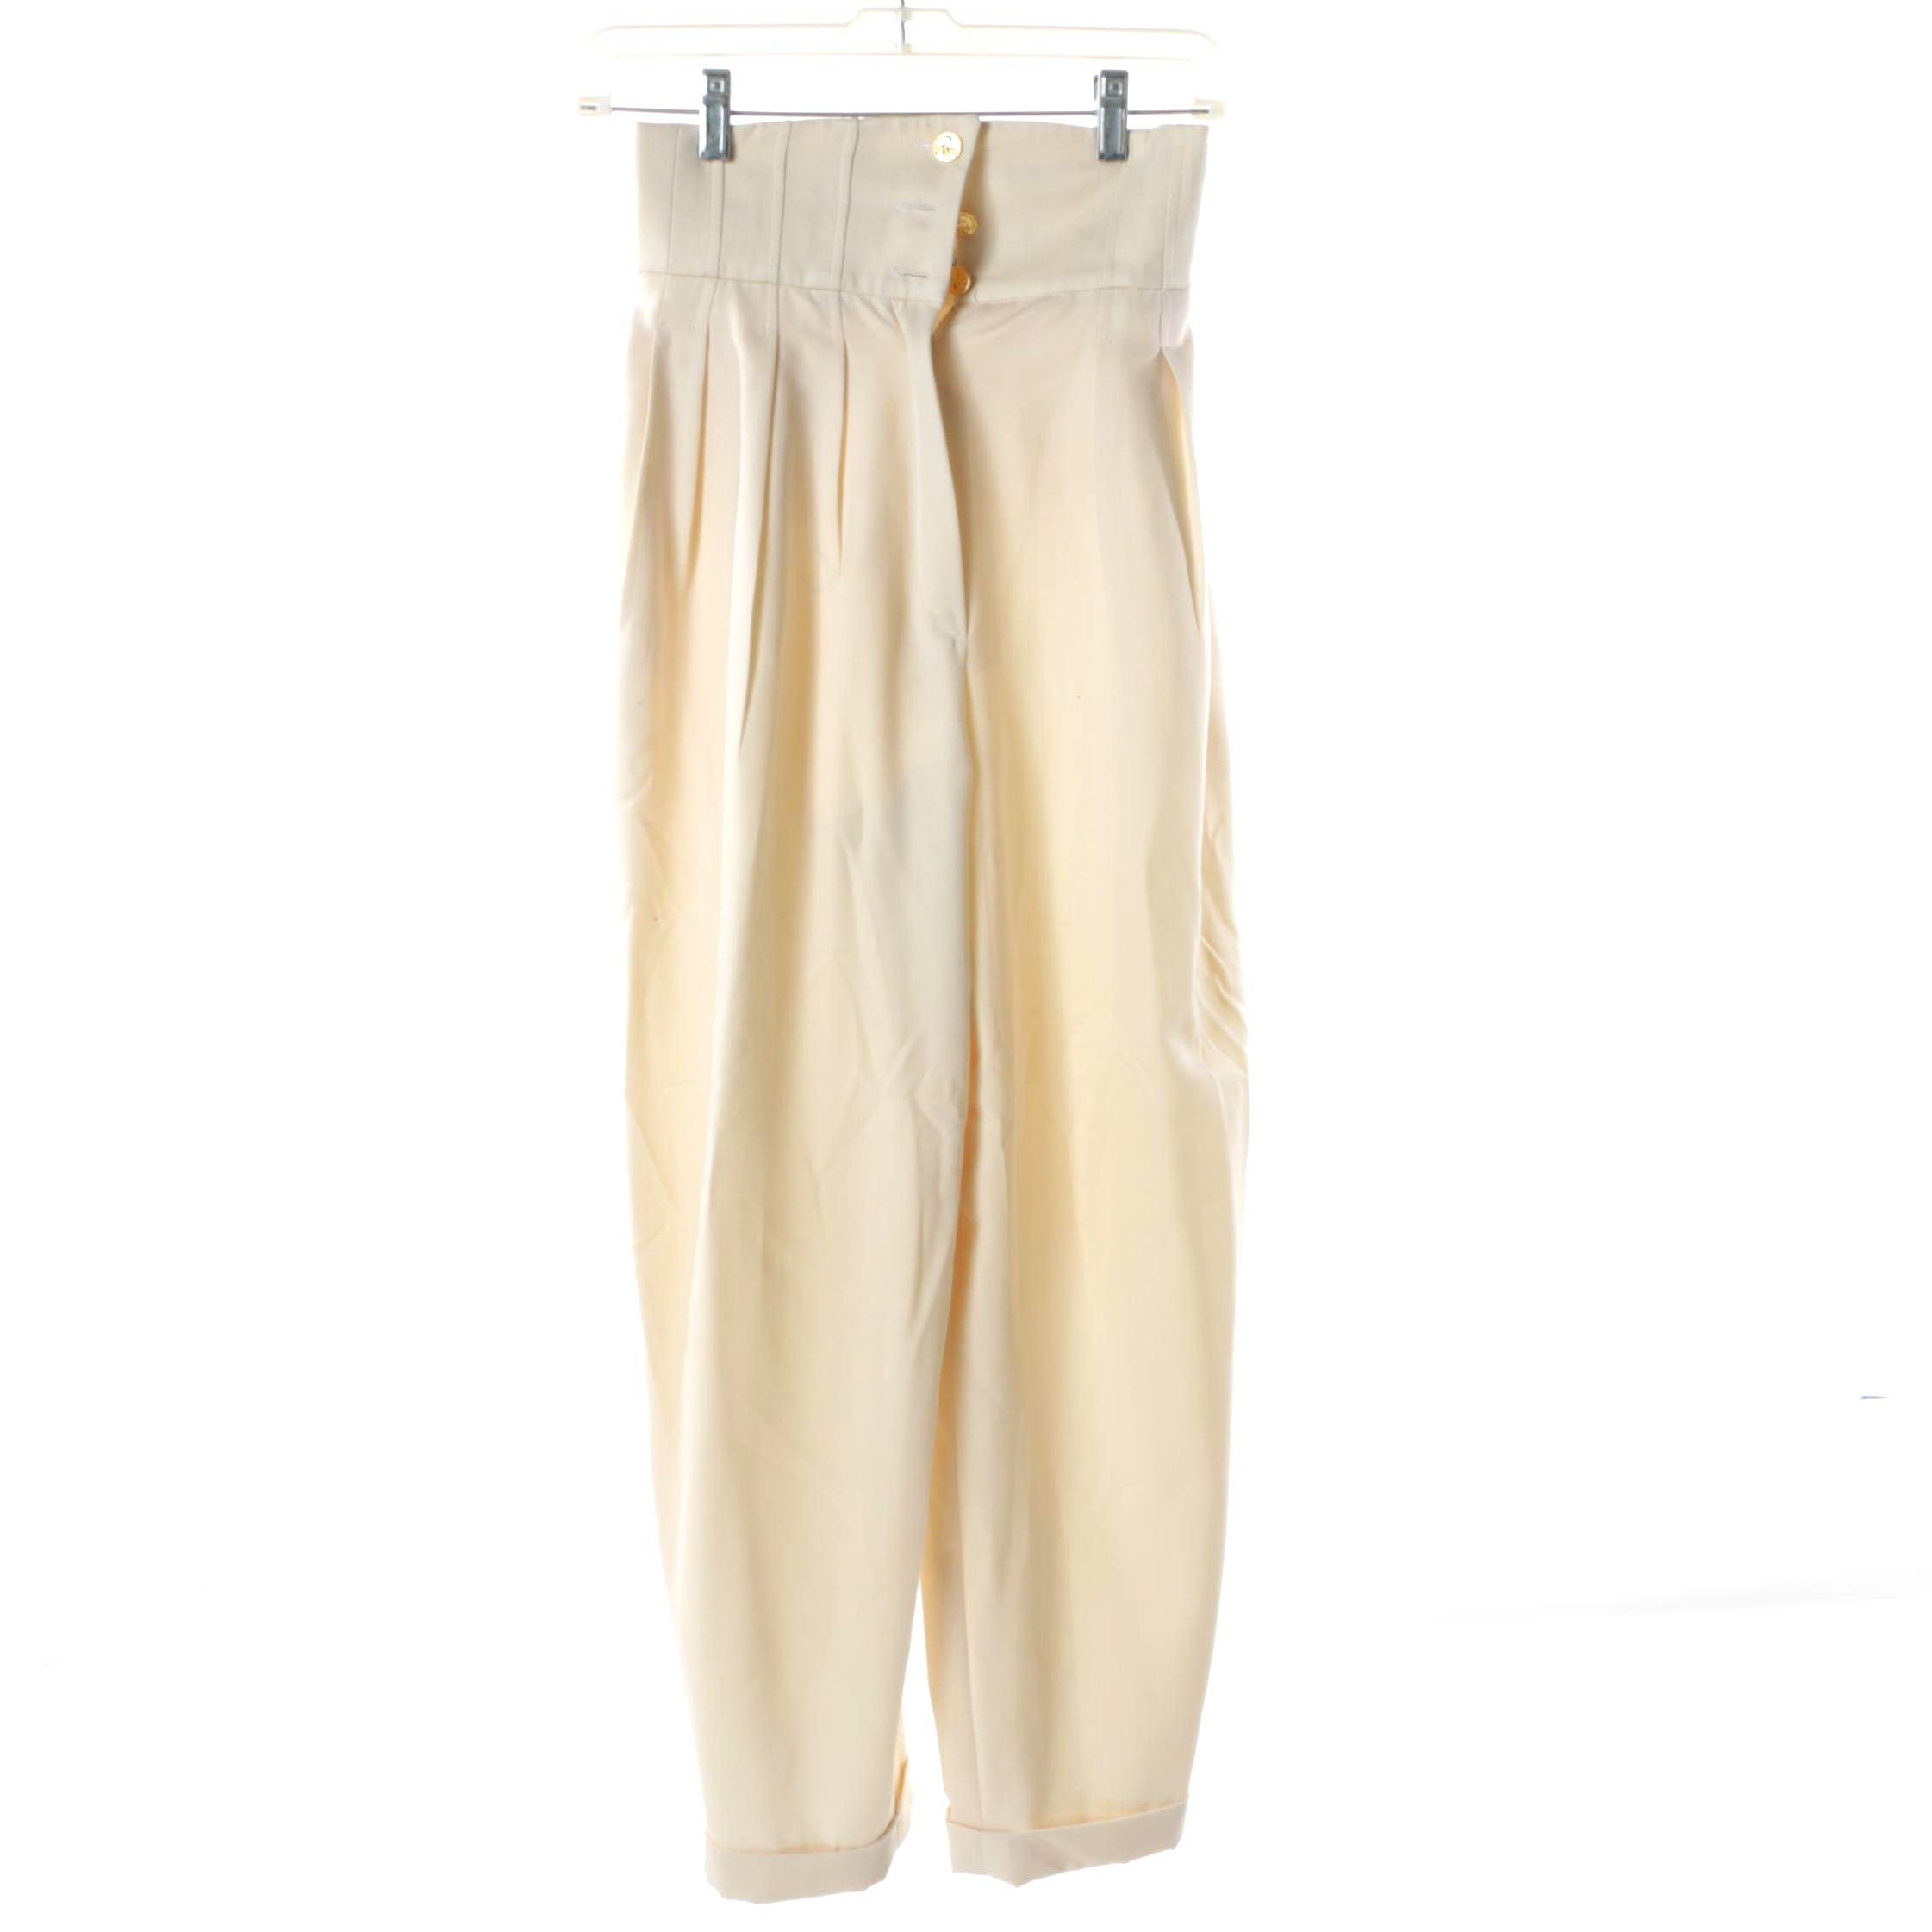 Women's 1980s Vintage Chanel Boutique Cream Silk Trousers